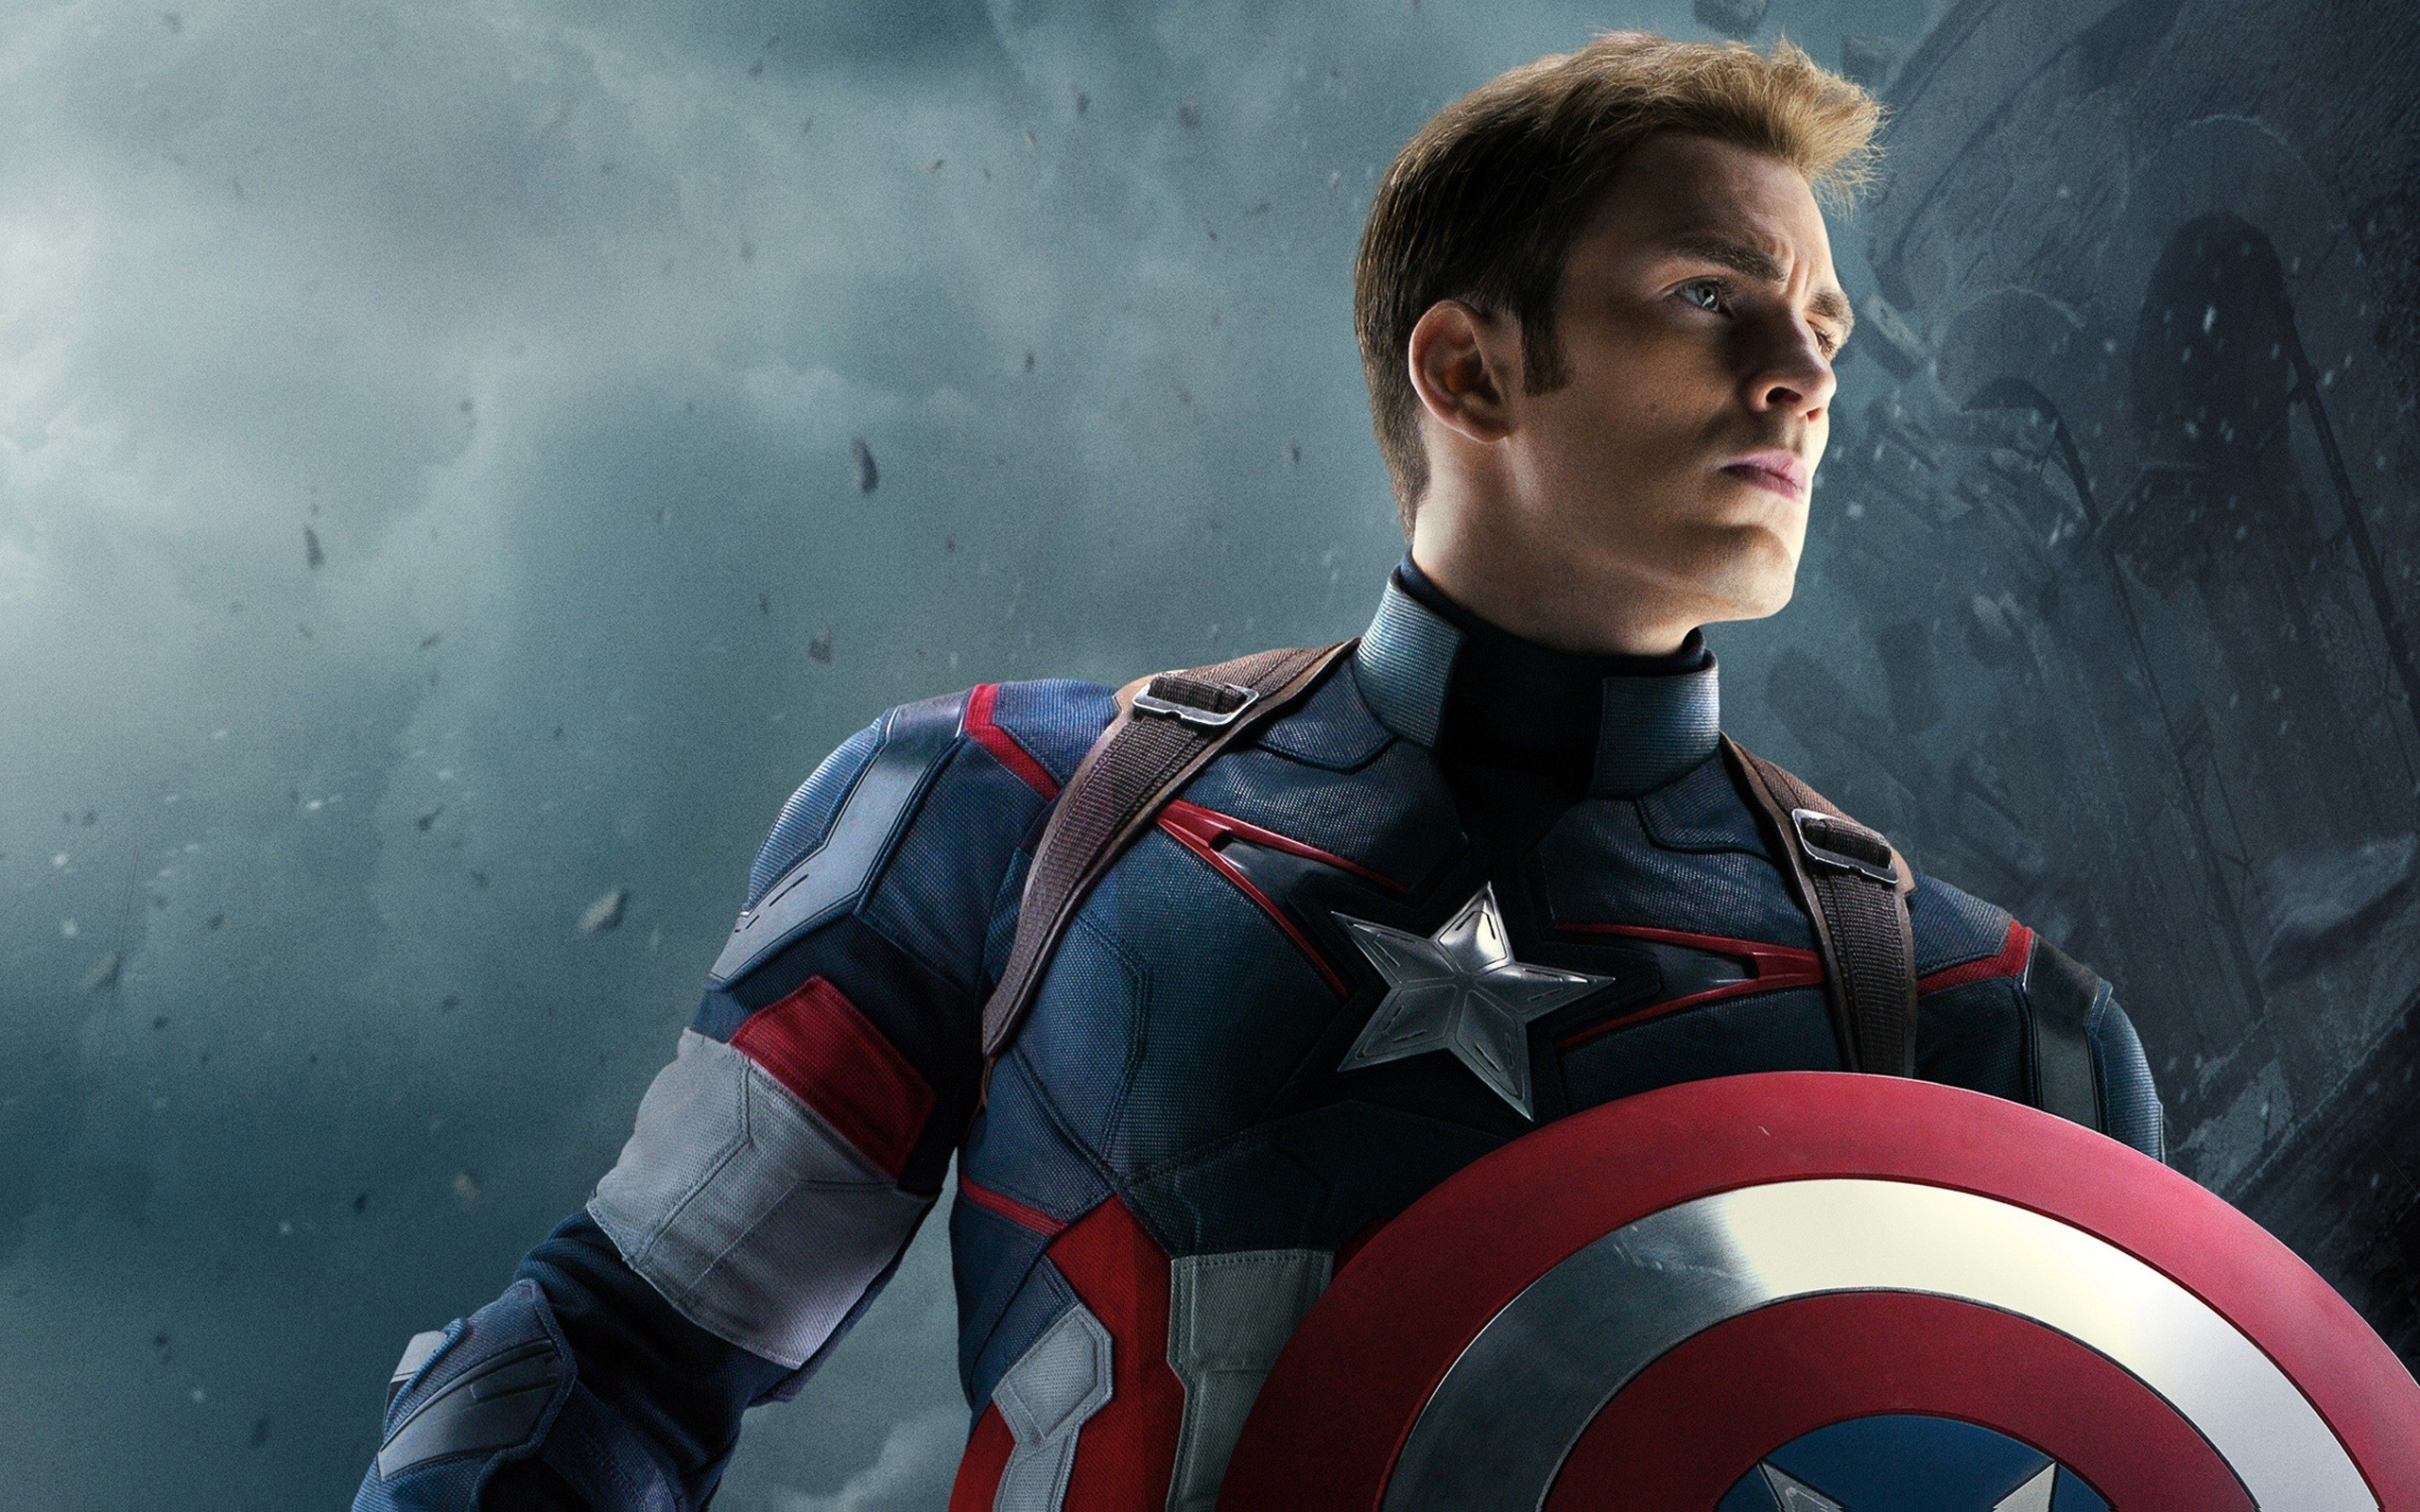 Chris-Evans-As-Captain-America-Wallpaper-HD • iOS Mode